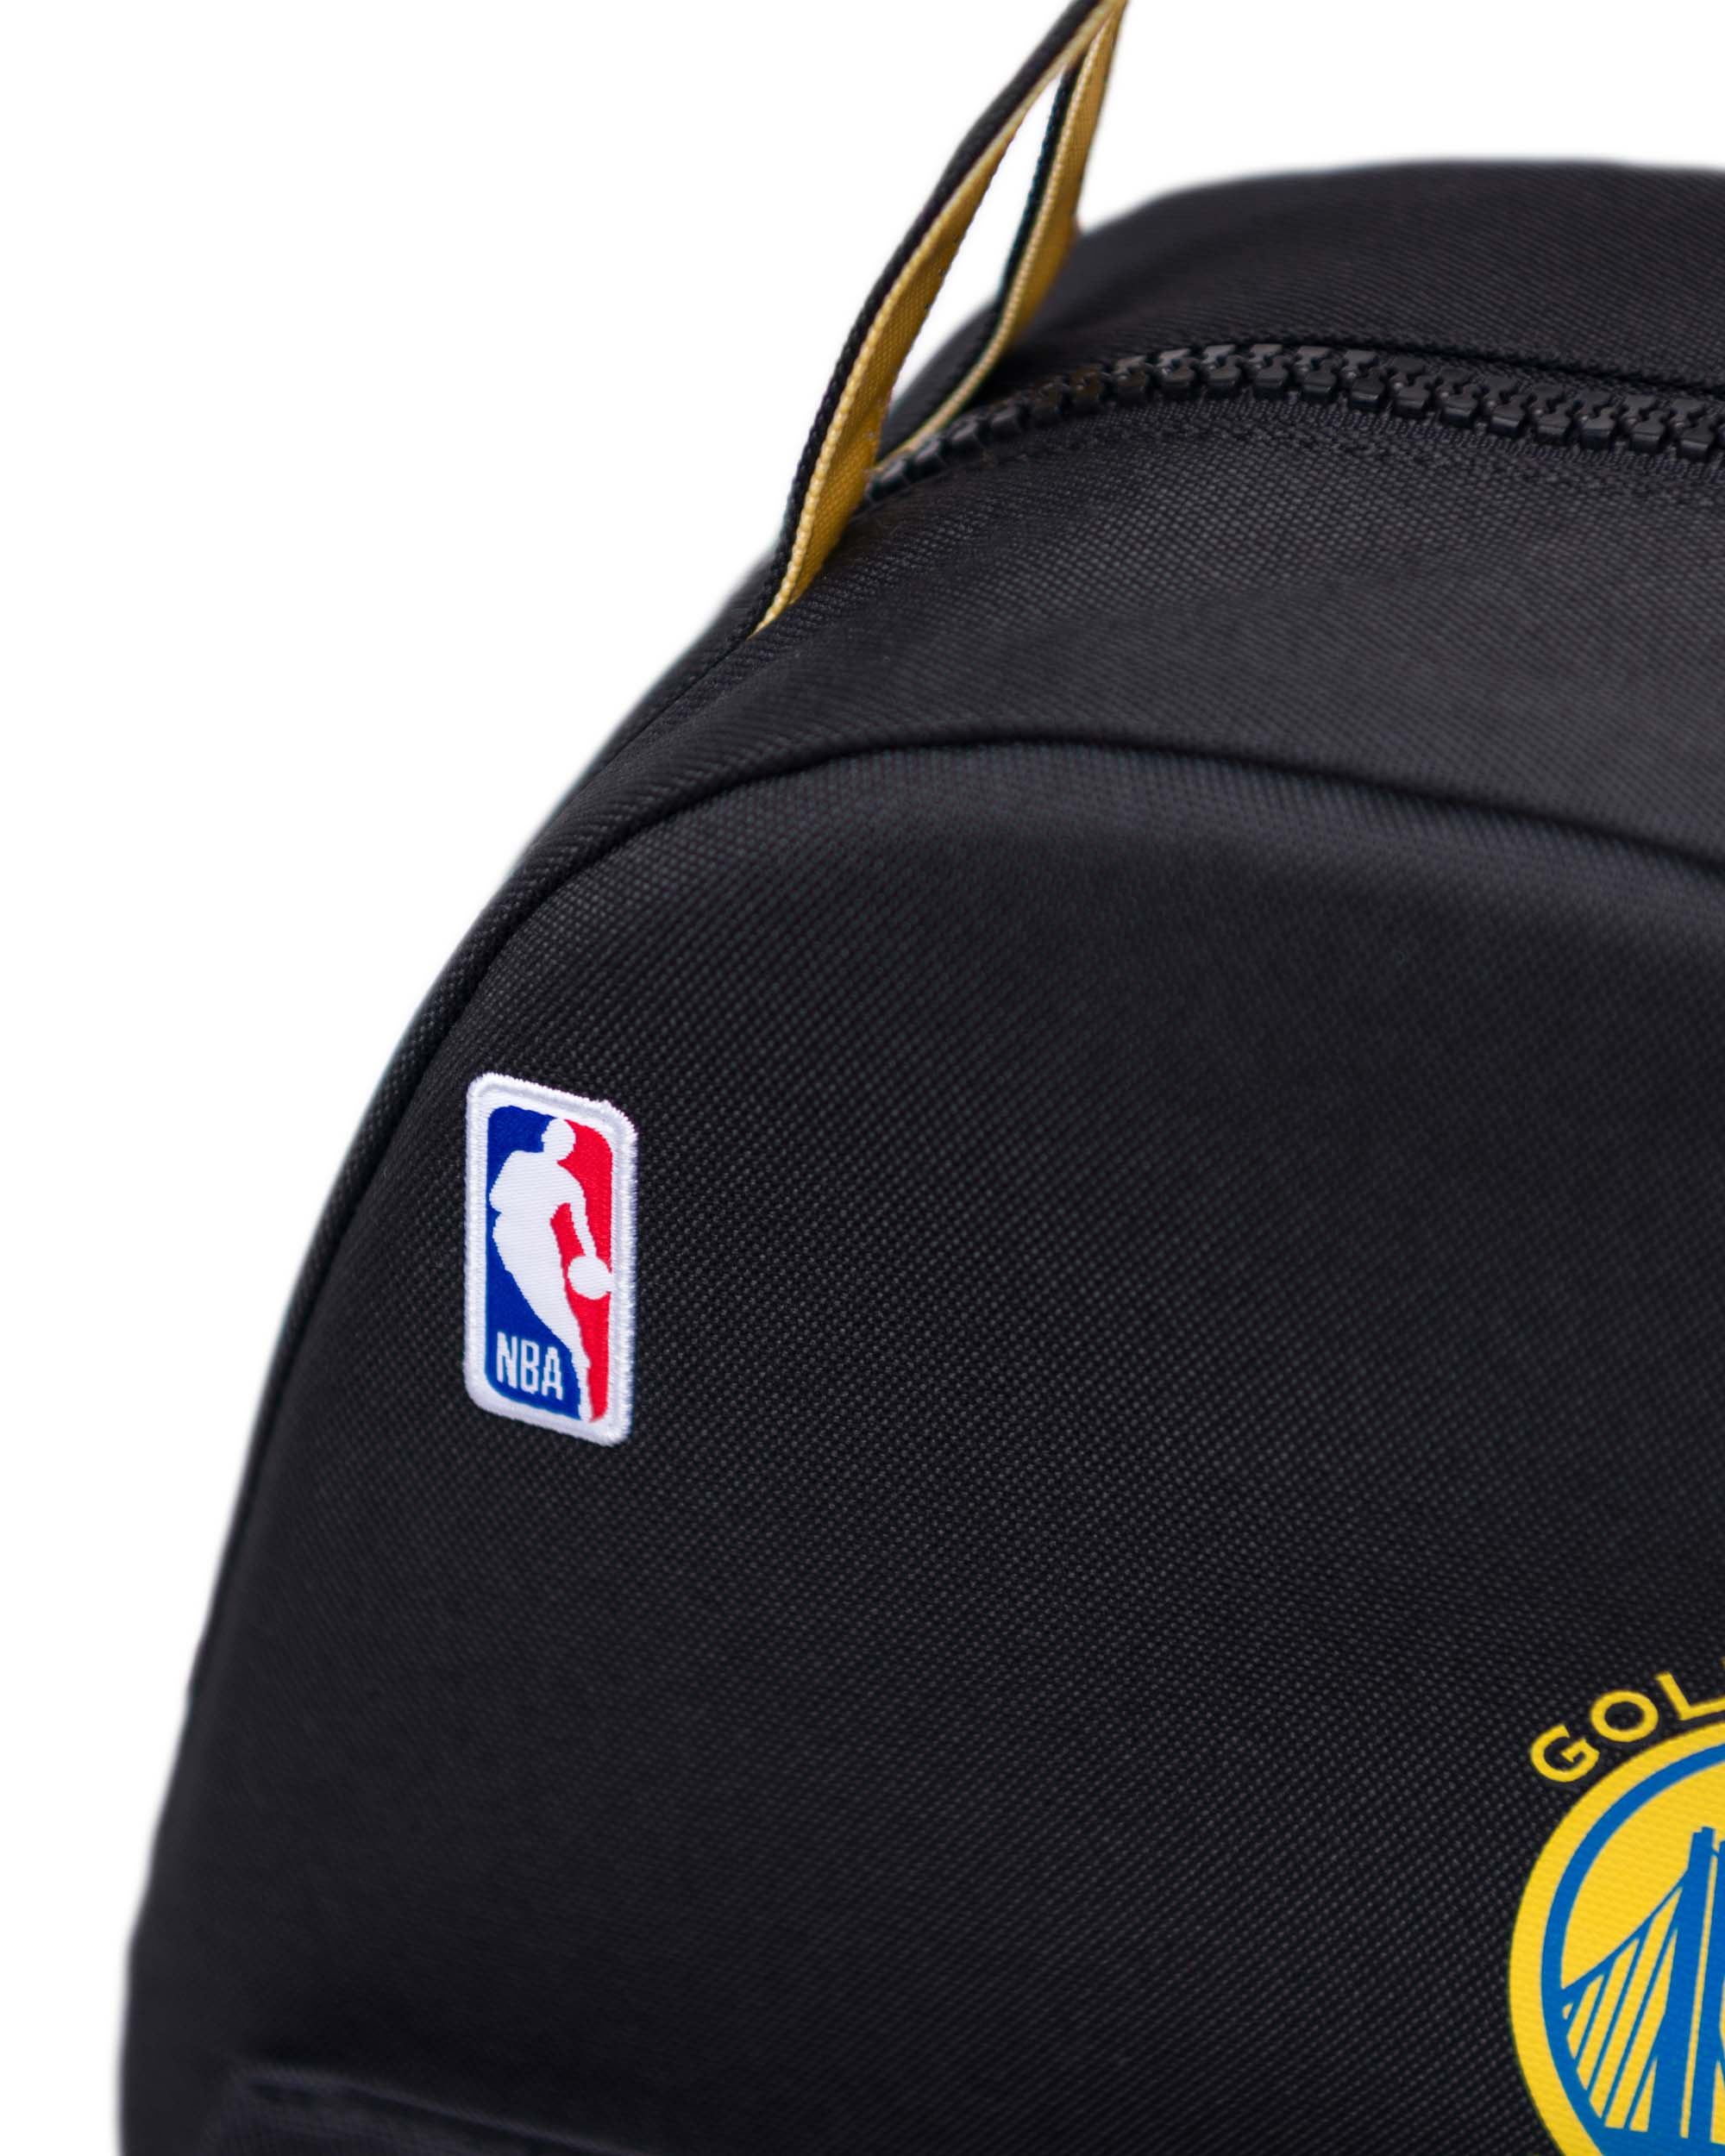 2548e12b7dff ... NBA and Herschel Supply woven labels